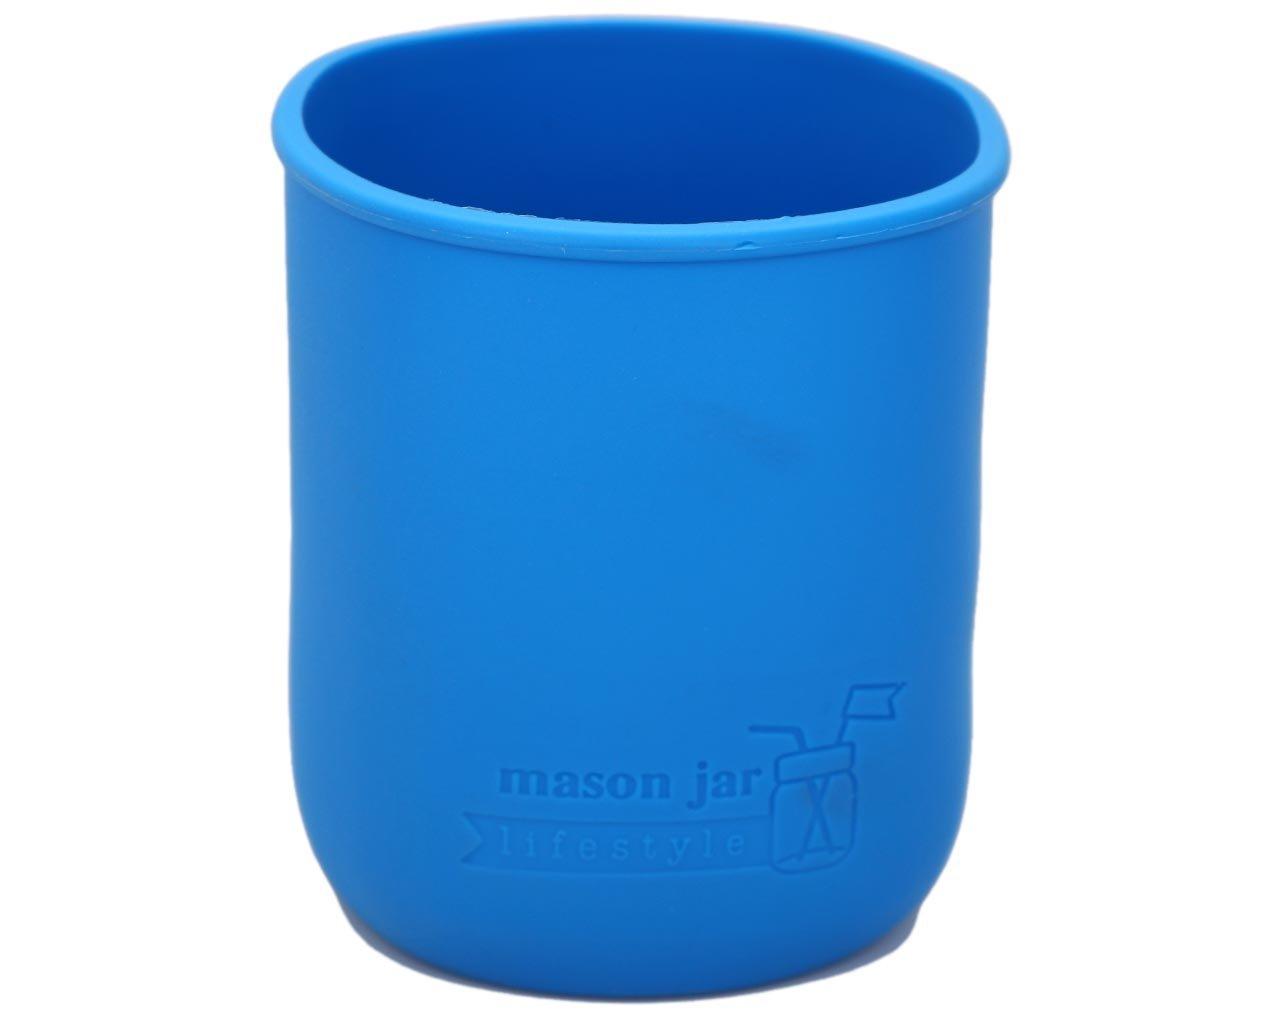 MJL Quart Silicone Sleeve for Mason Jars (Bright Blue, 2 Pack)